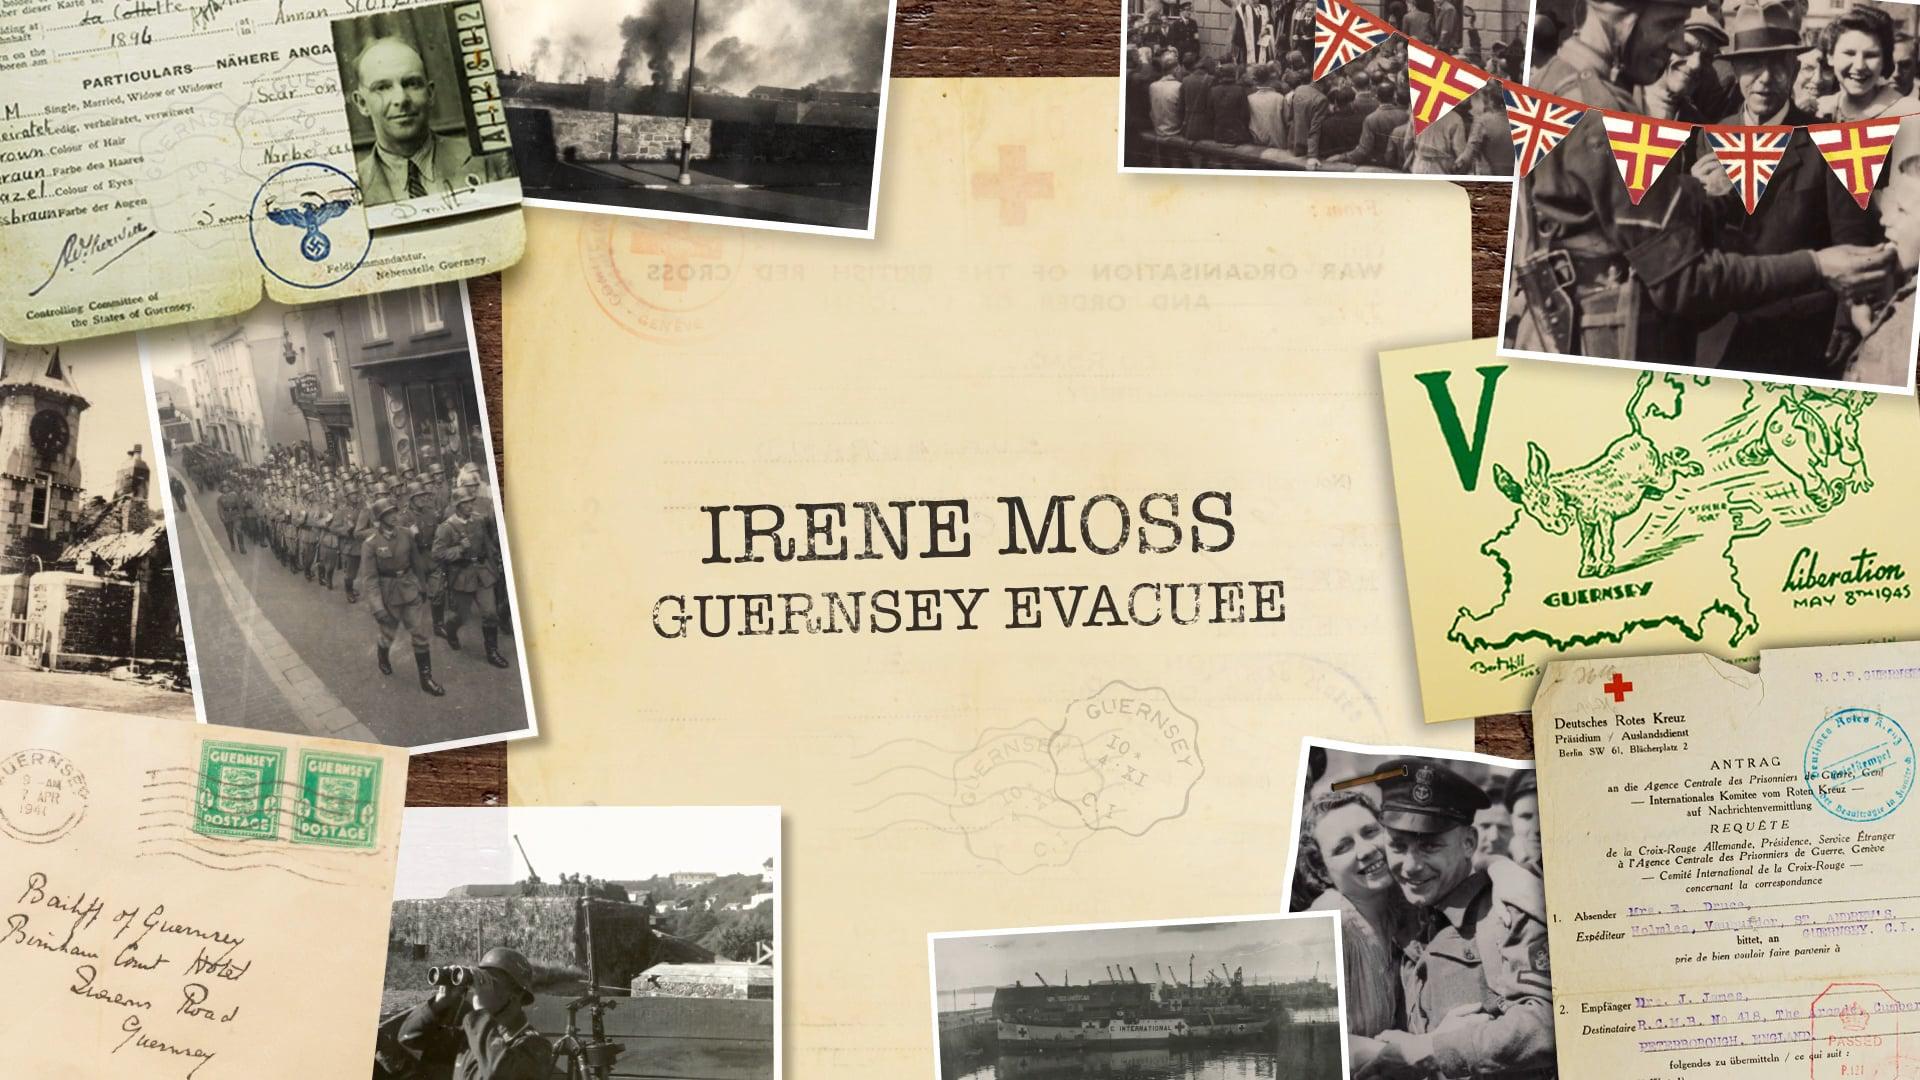 Evacuee Films - Irene Moss